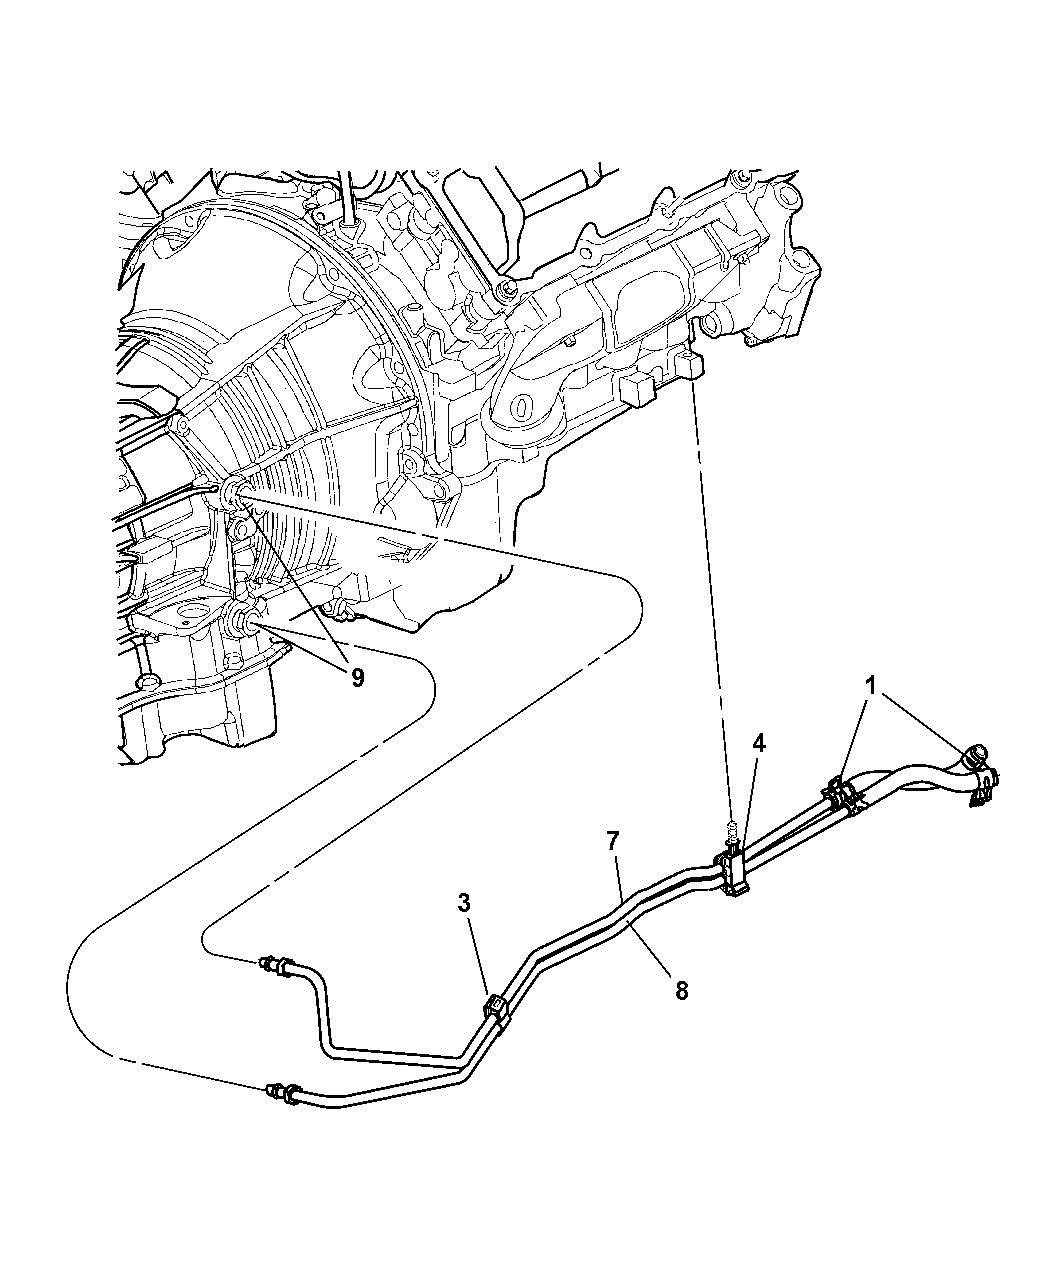 04 jeep liberty transmission